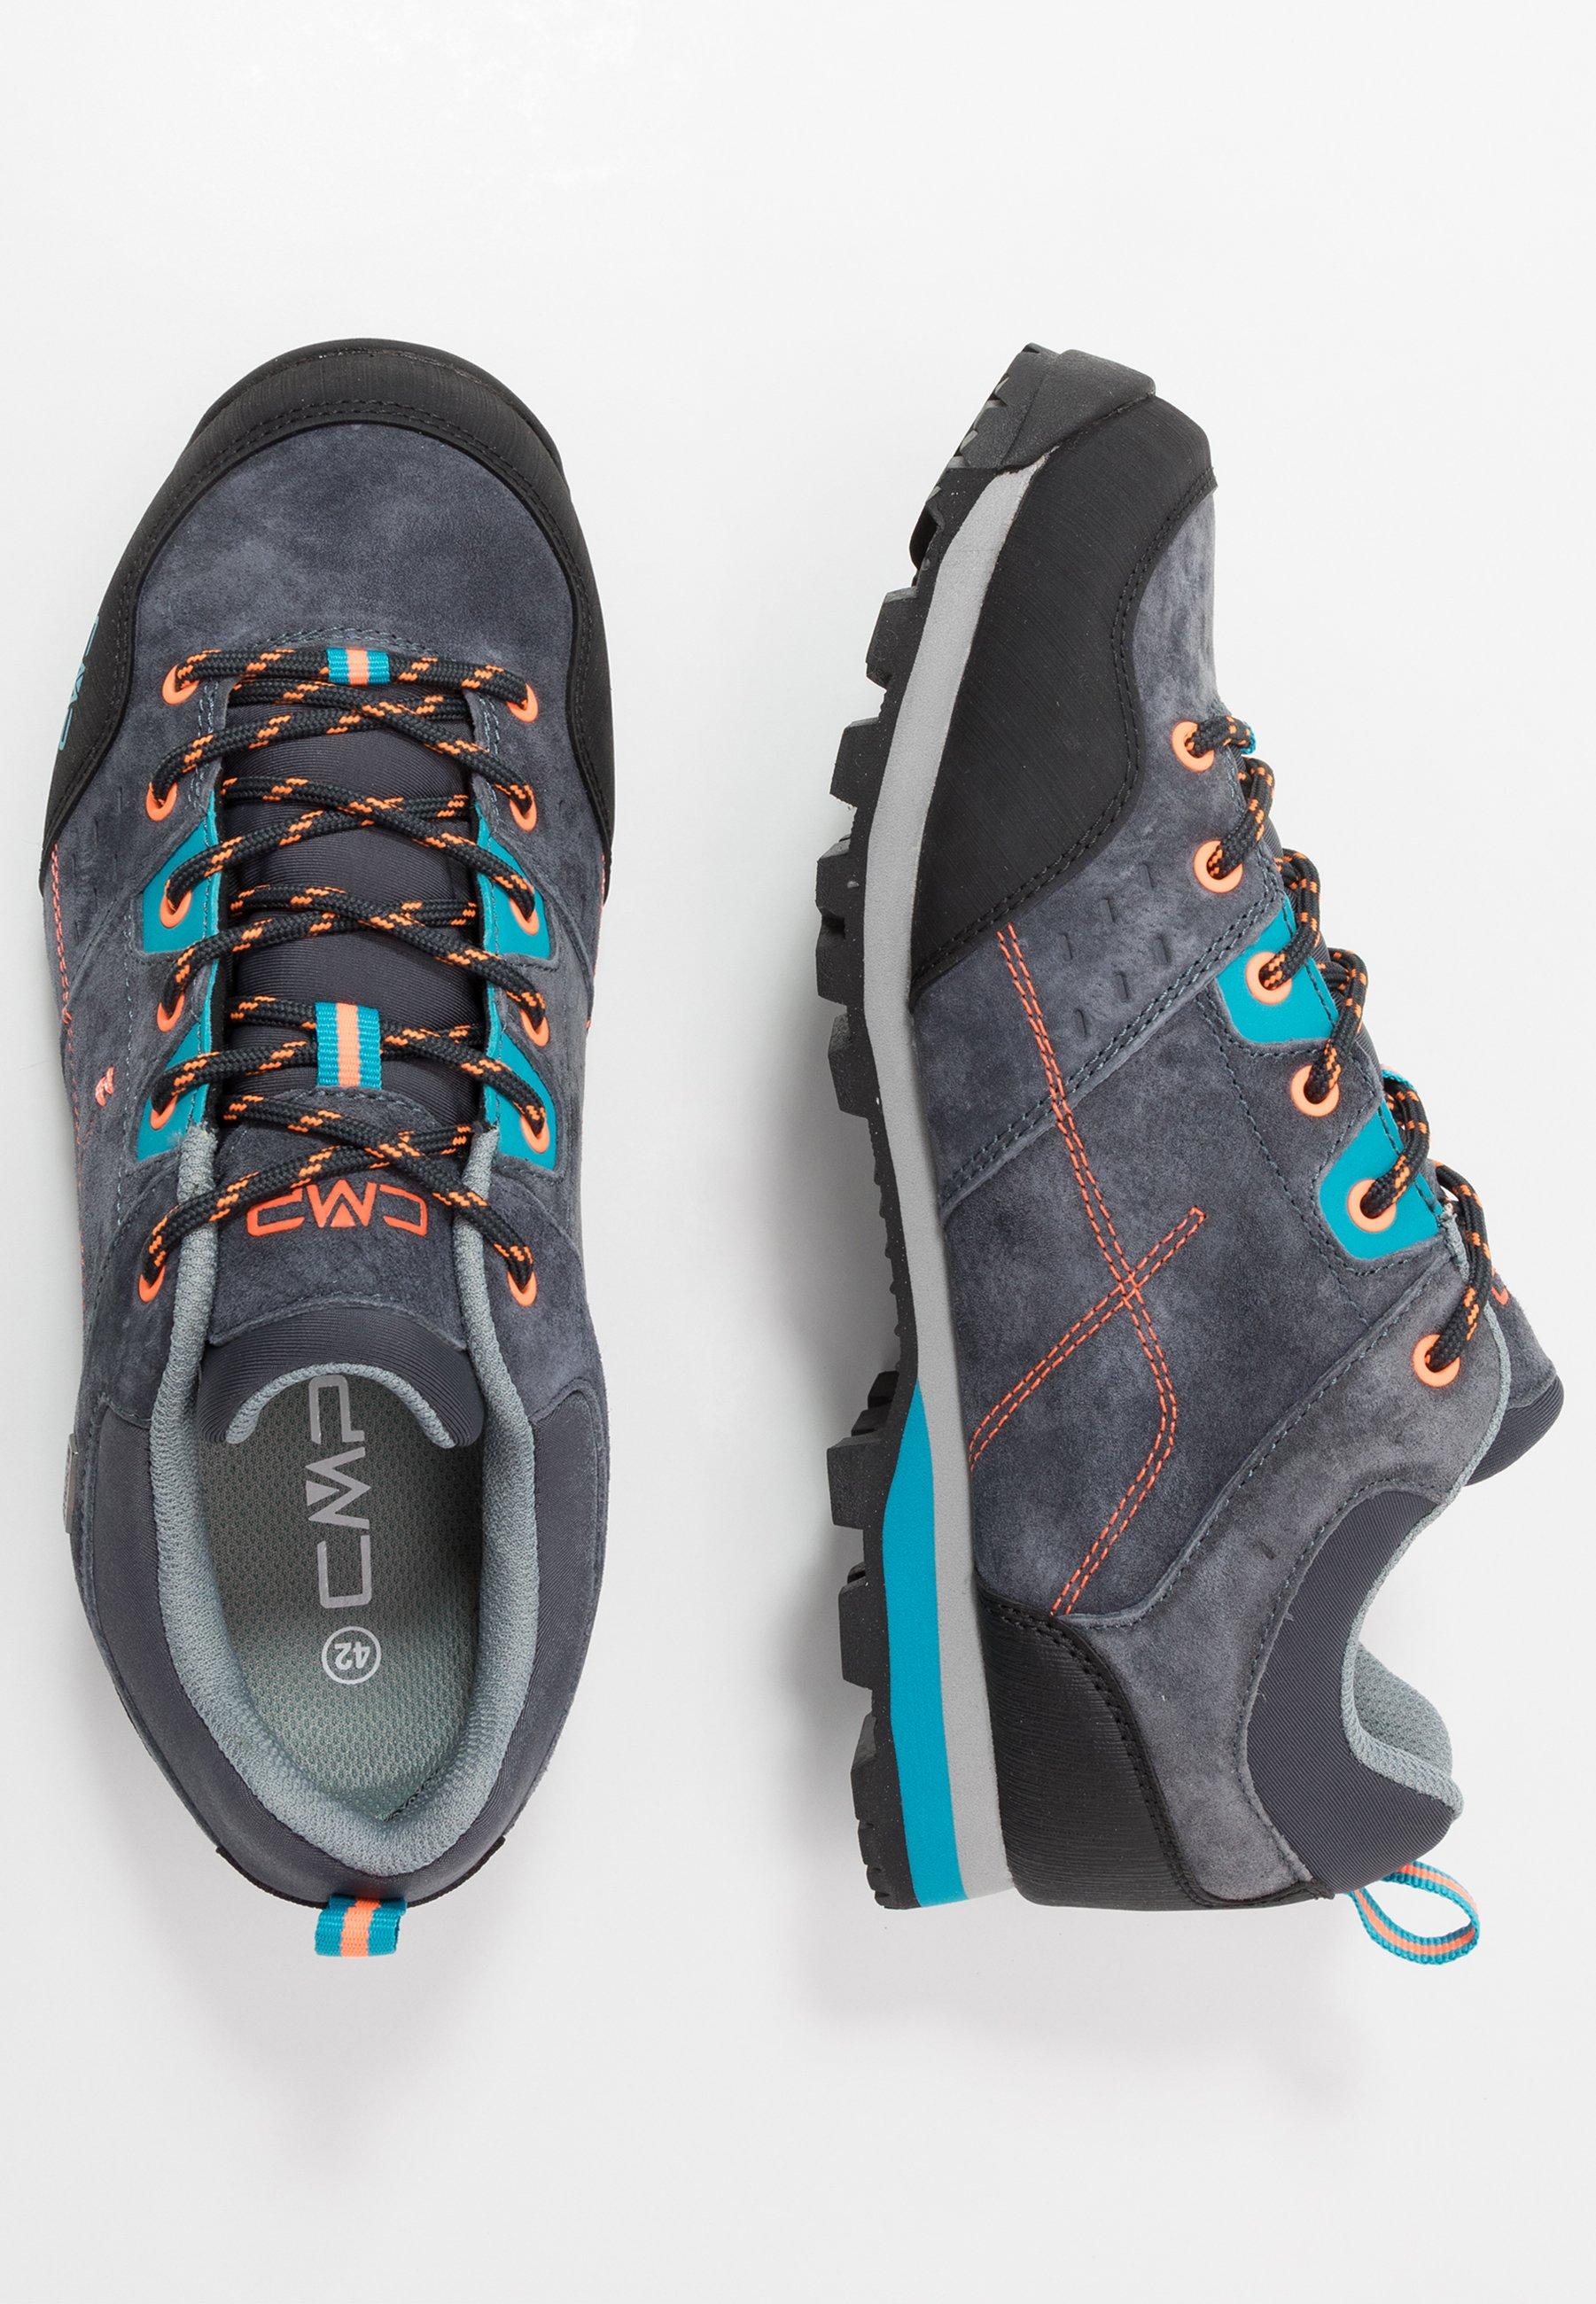 ALCOR LOW TREKKING SHOE WP Hikingskor antracite